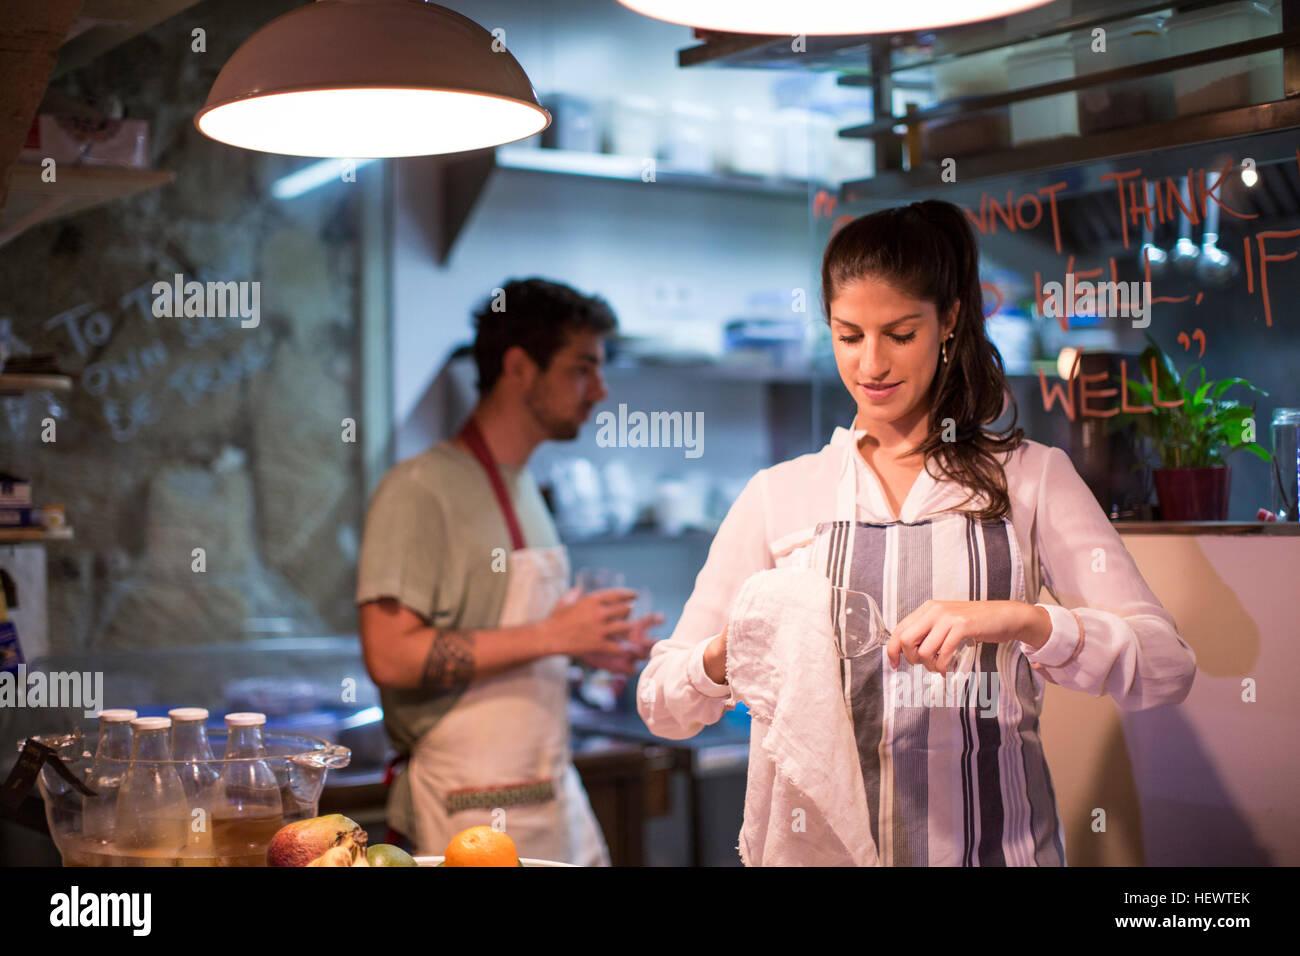 Restaurantbesitzer in Küche Stockbild